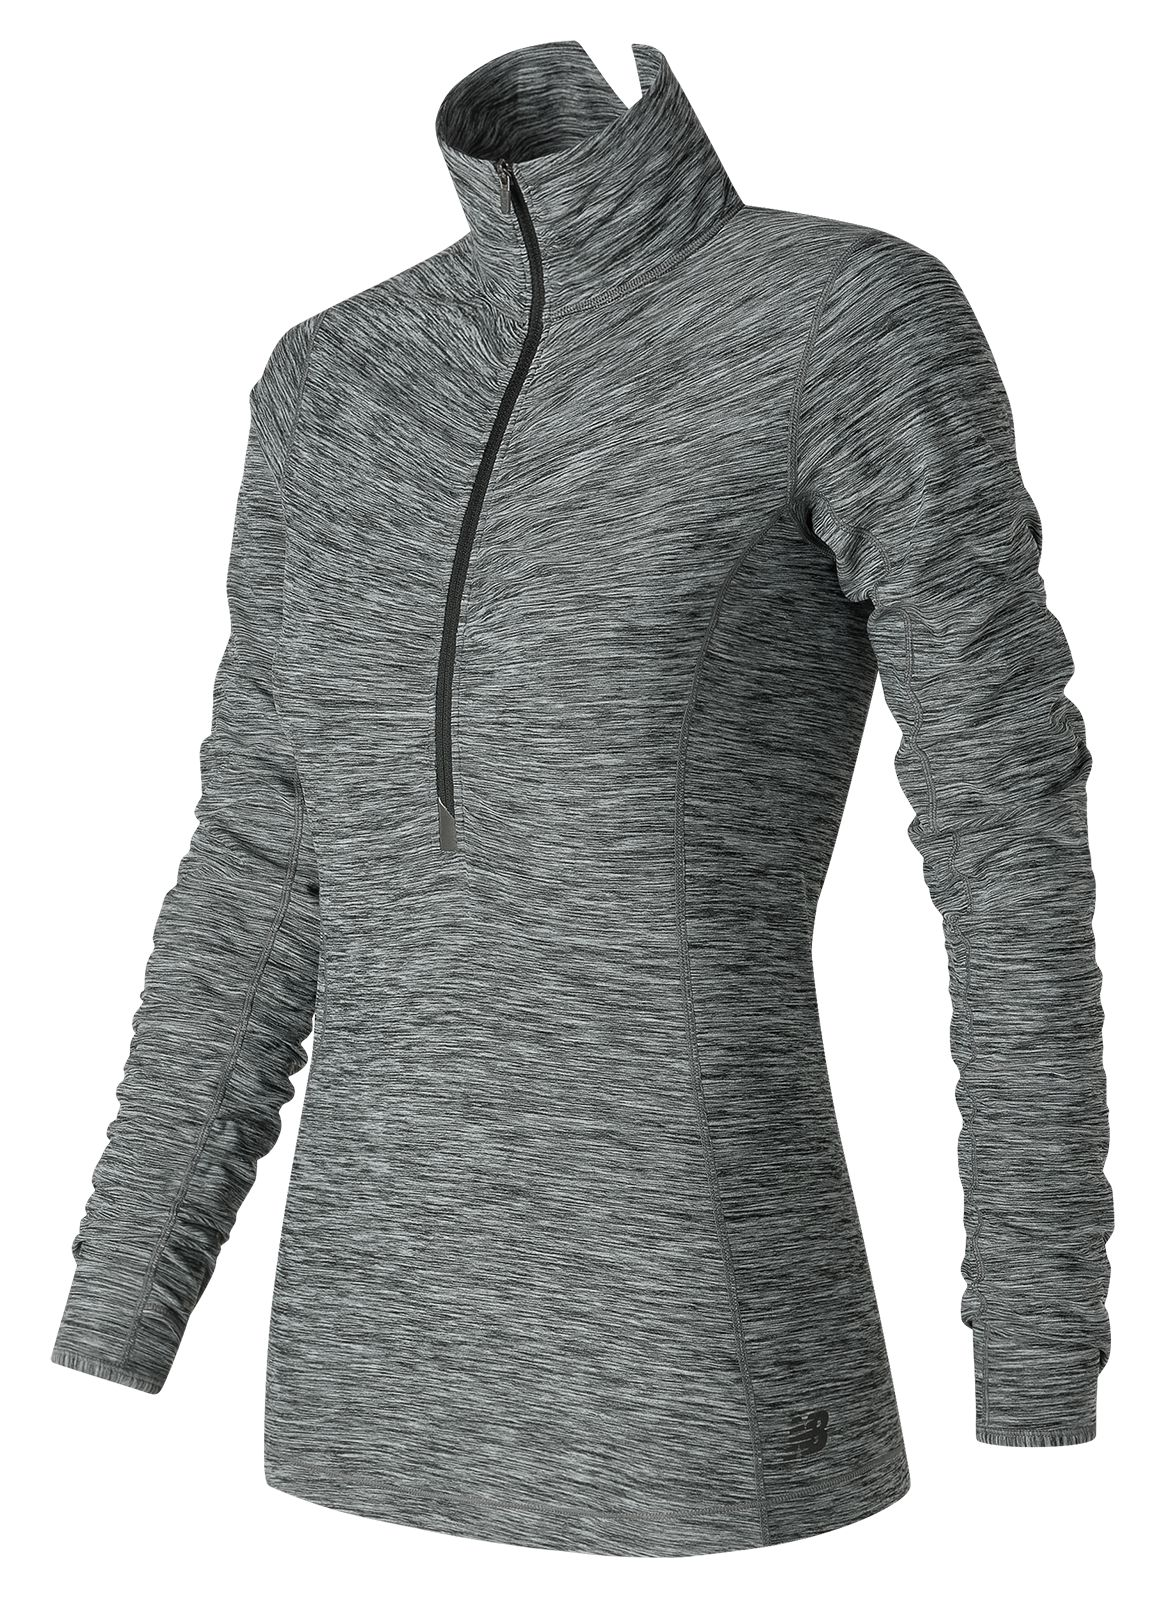 New balance jacket price